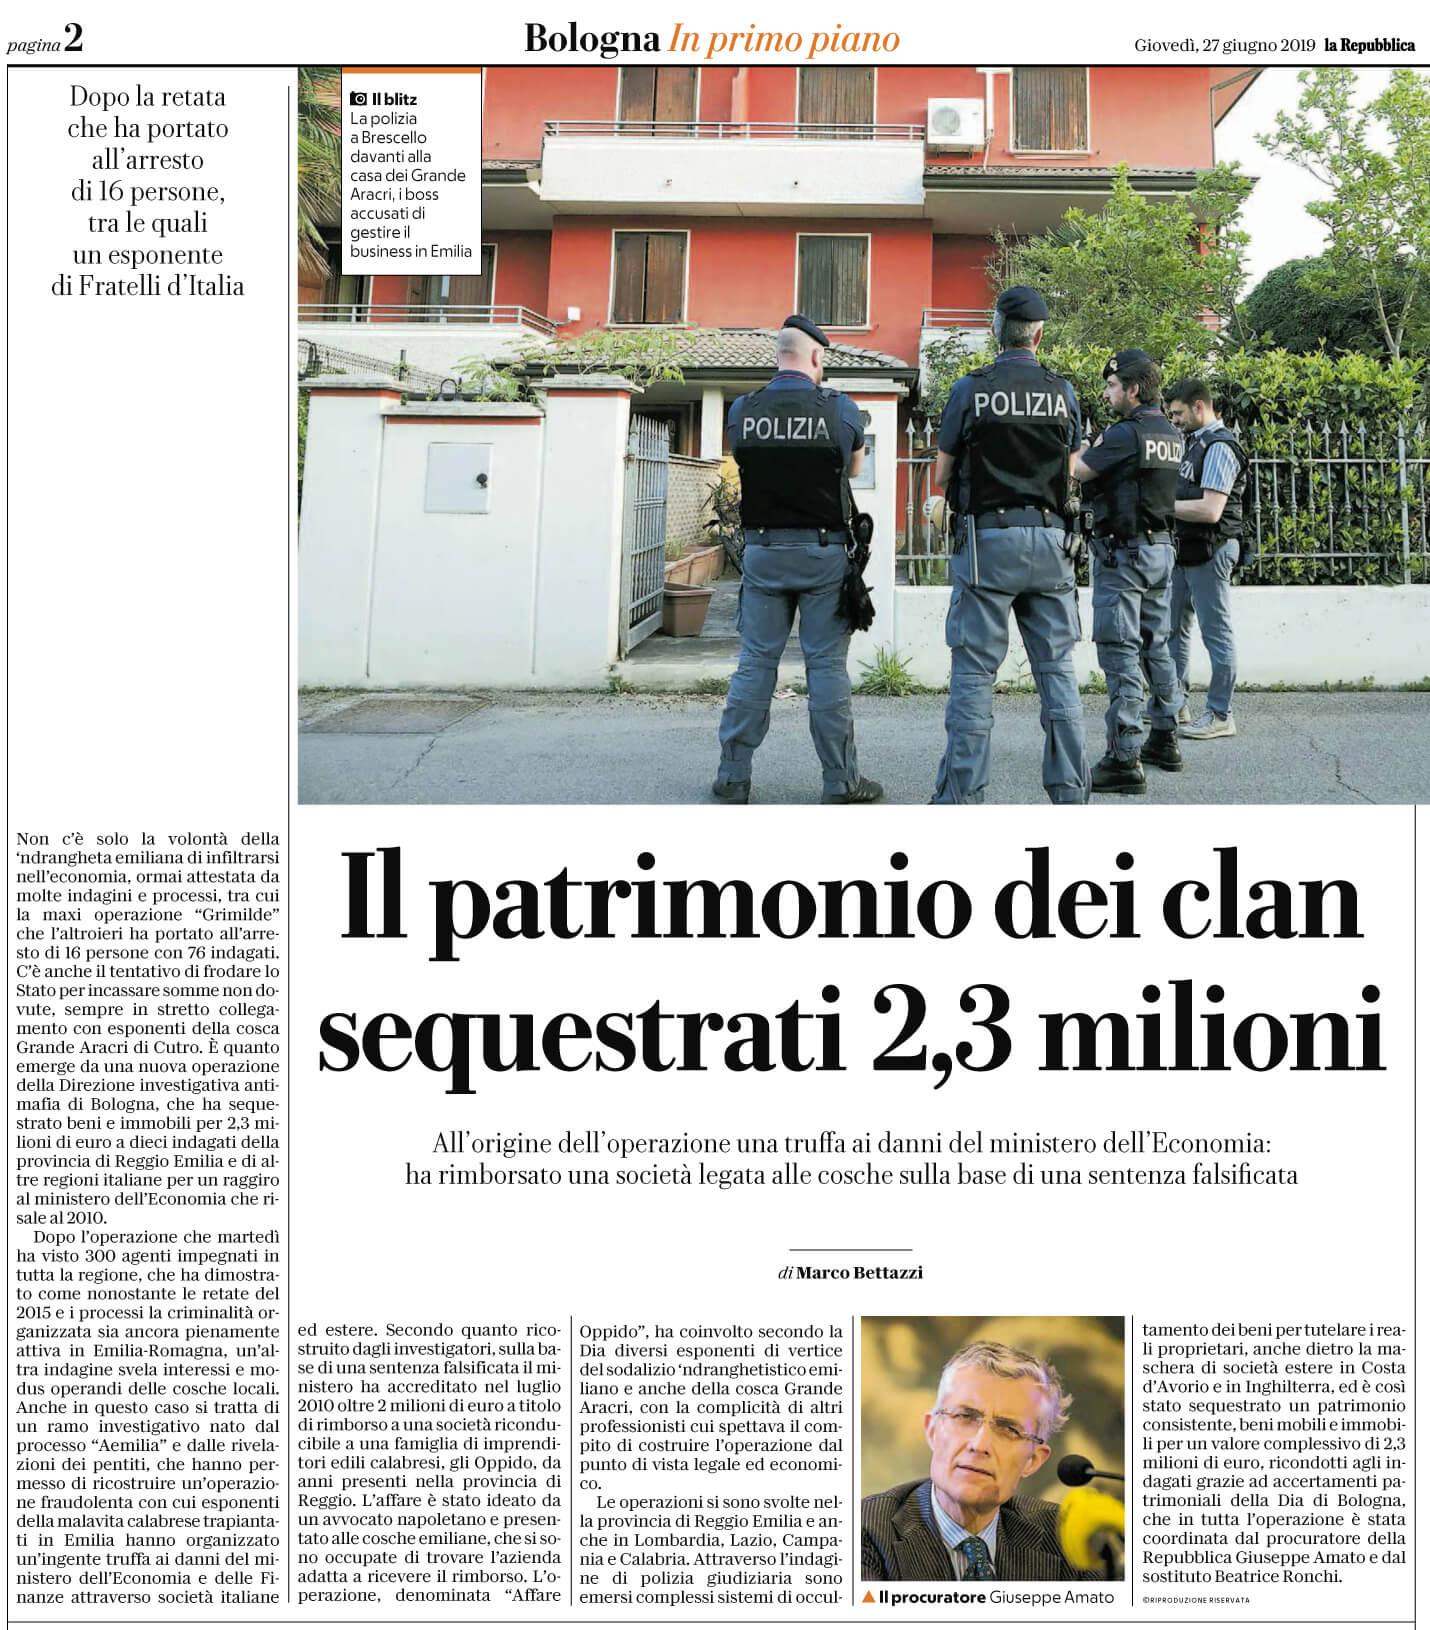 Sequestrati 2,3 milioni